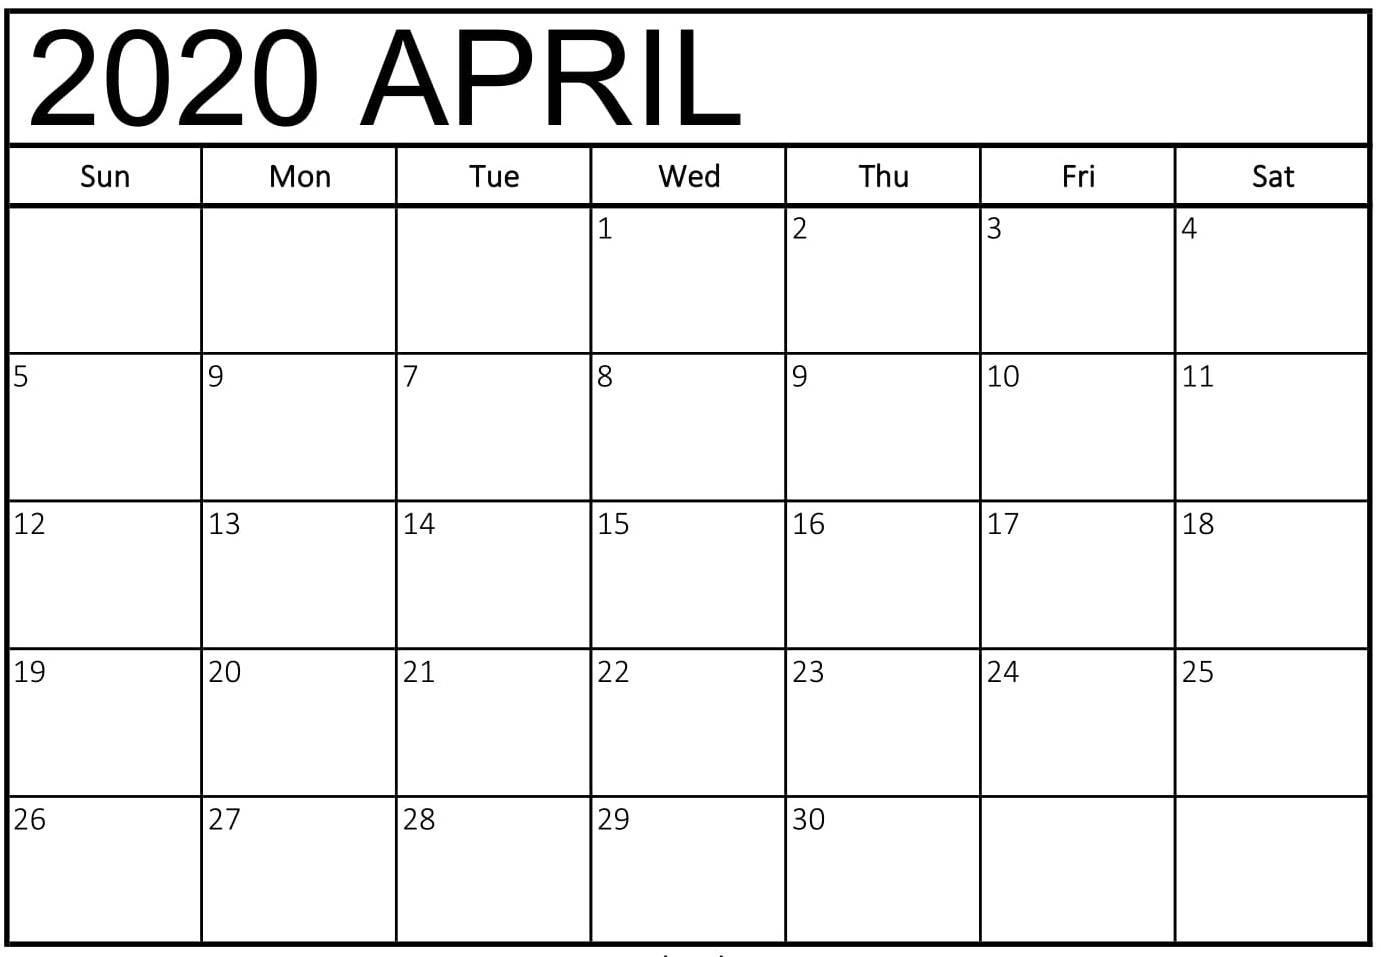 Blank Calendar April 2020 Printable - 2019 Calendars For